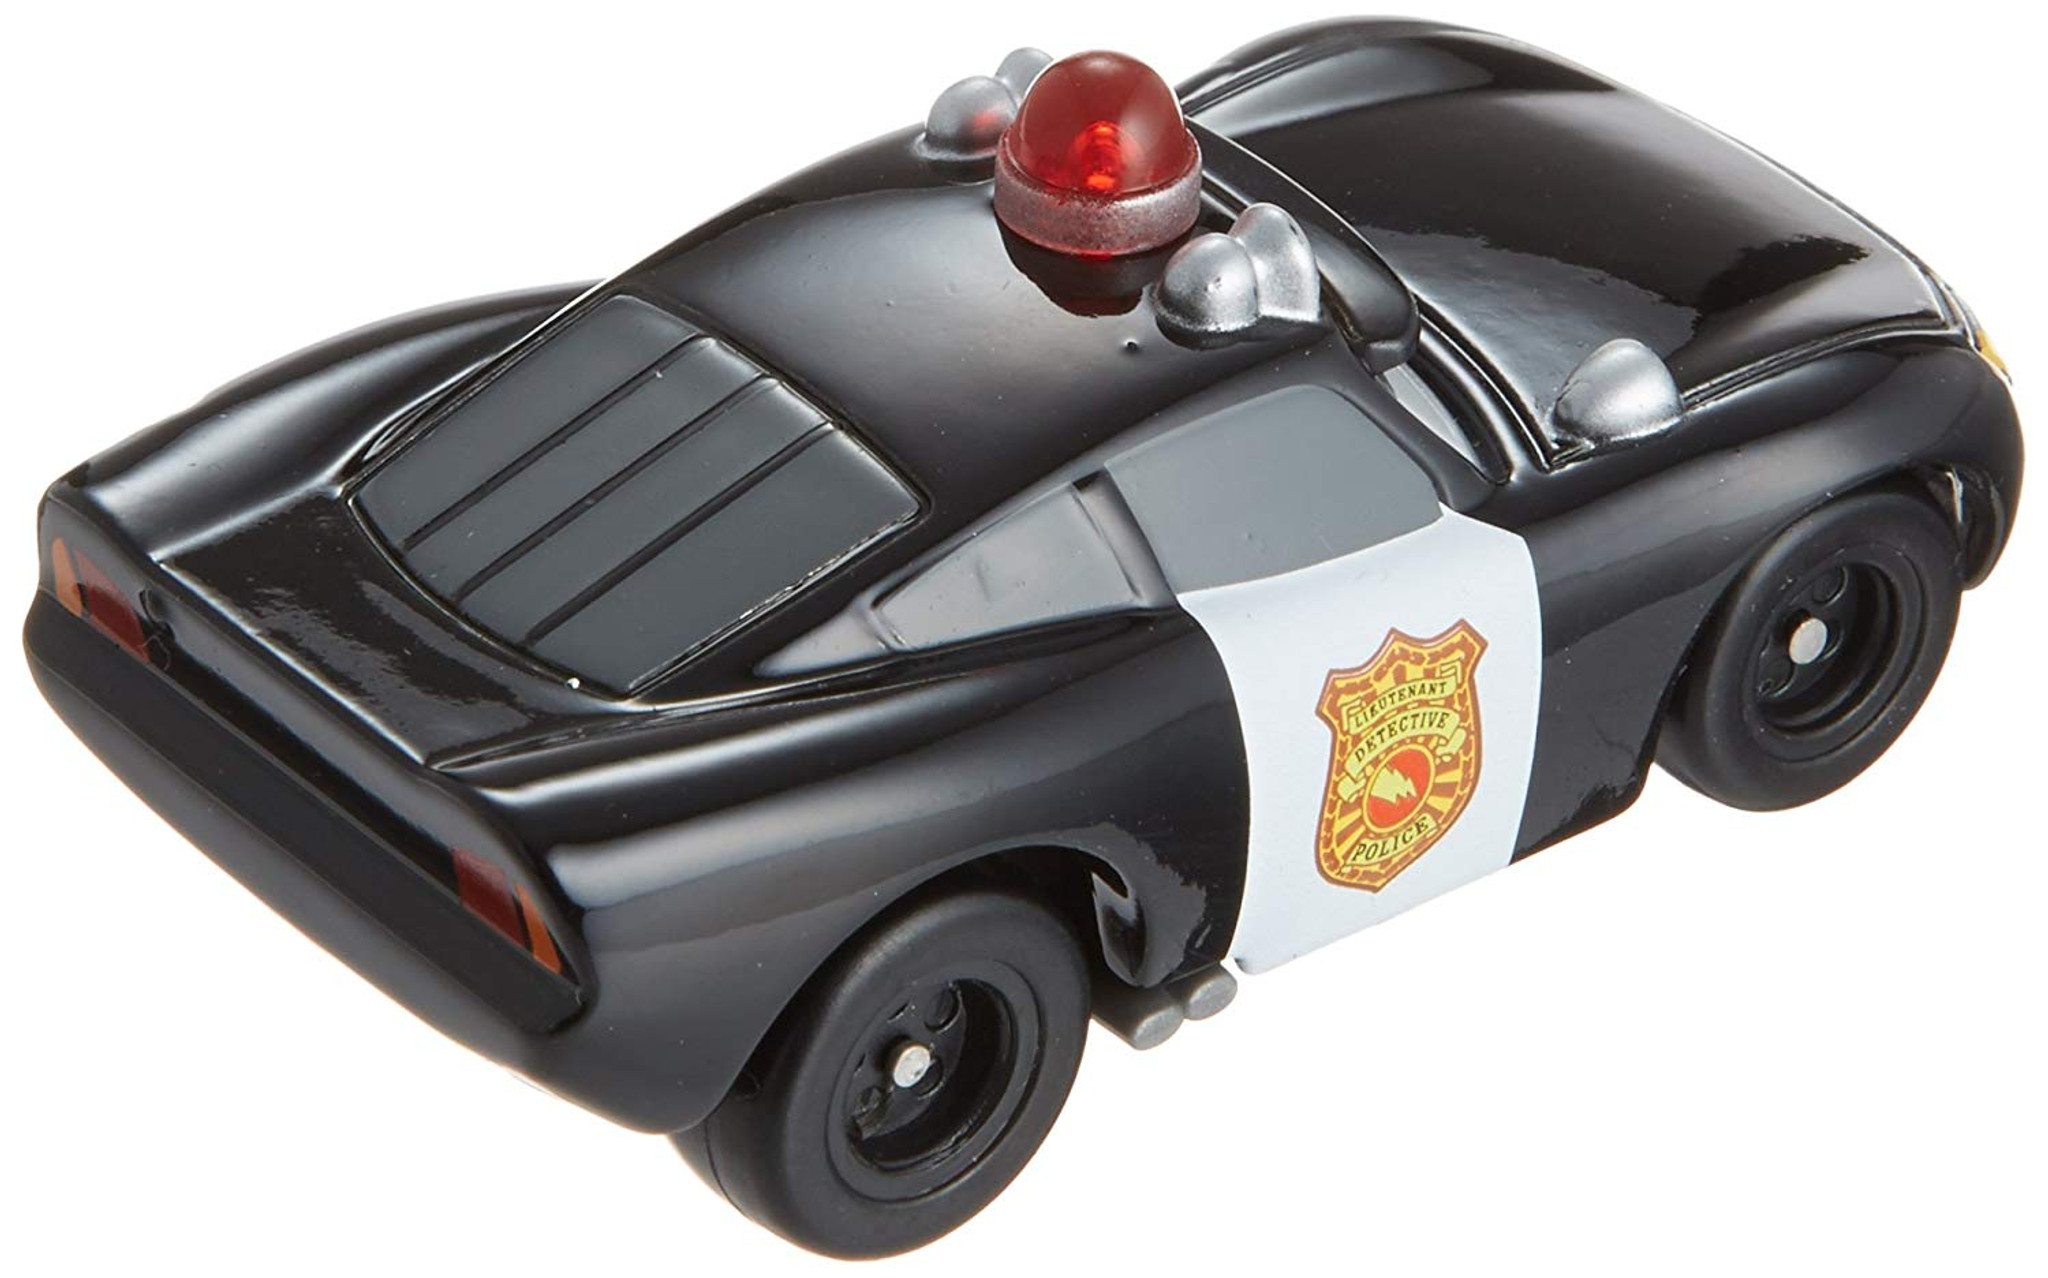 Kunst TAKARA TOMY TOMICA C-36 DISNEY PIXAR CARS 2 LIGHTNING MCQUEEN TOON POLICE TYPE Antiquitäten & Kunst